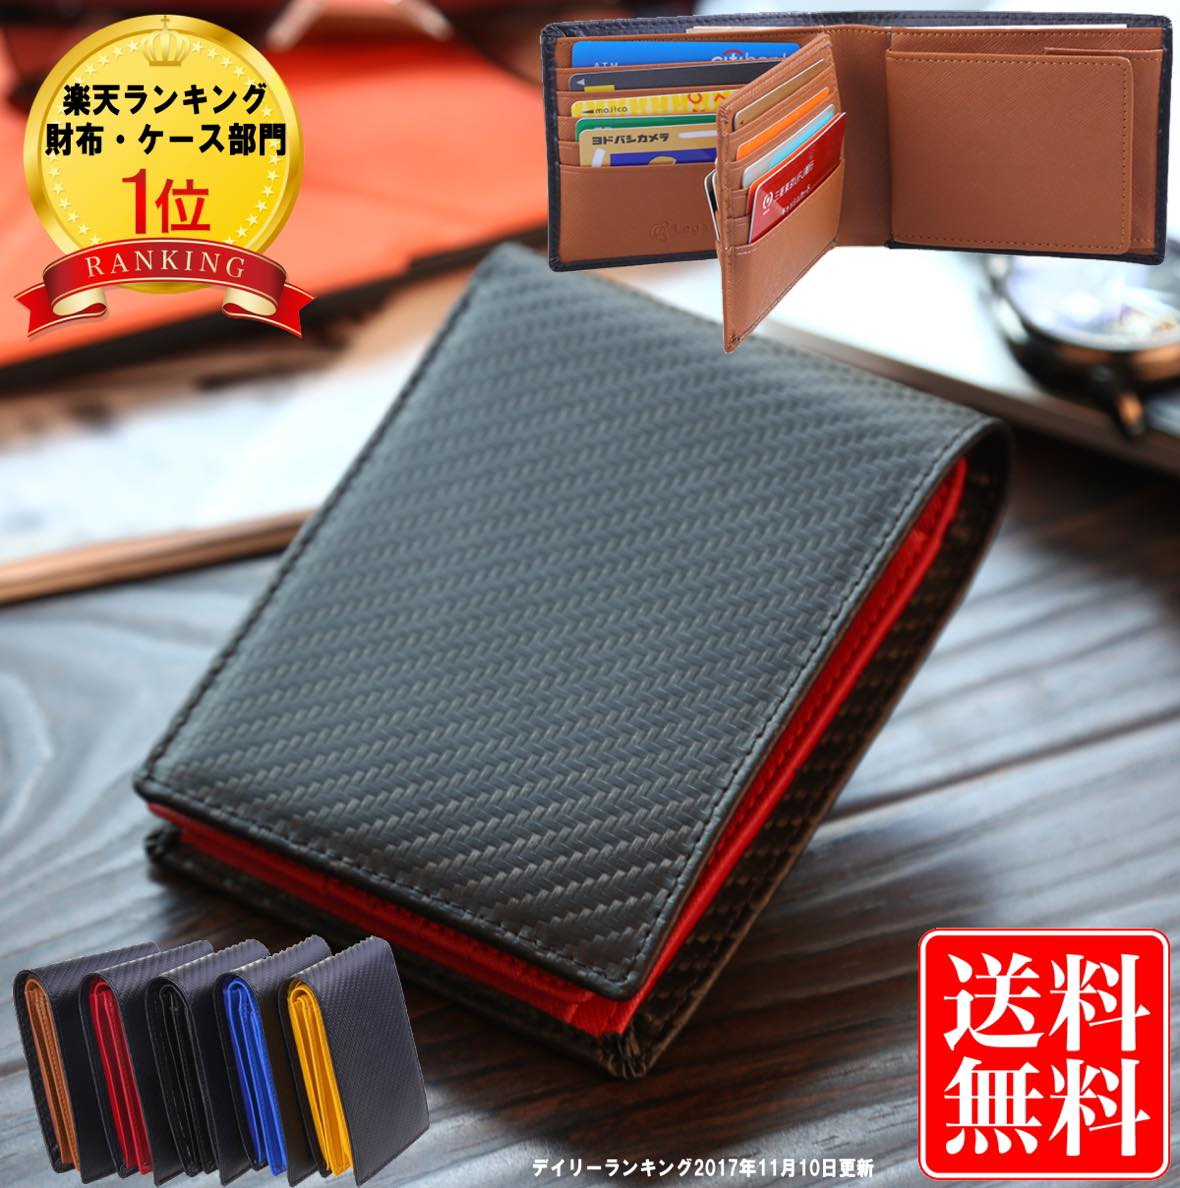 d2aa75852858b3 送料無料 財布 メンズ 二つ折り財布 使いやすい財布 ボックス型小銭入れ レディース 本